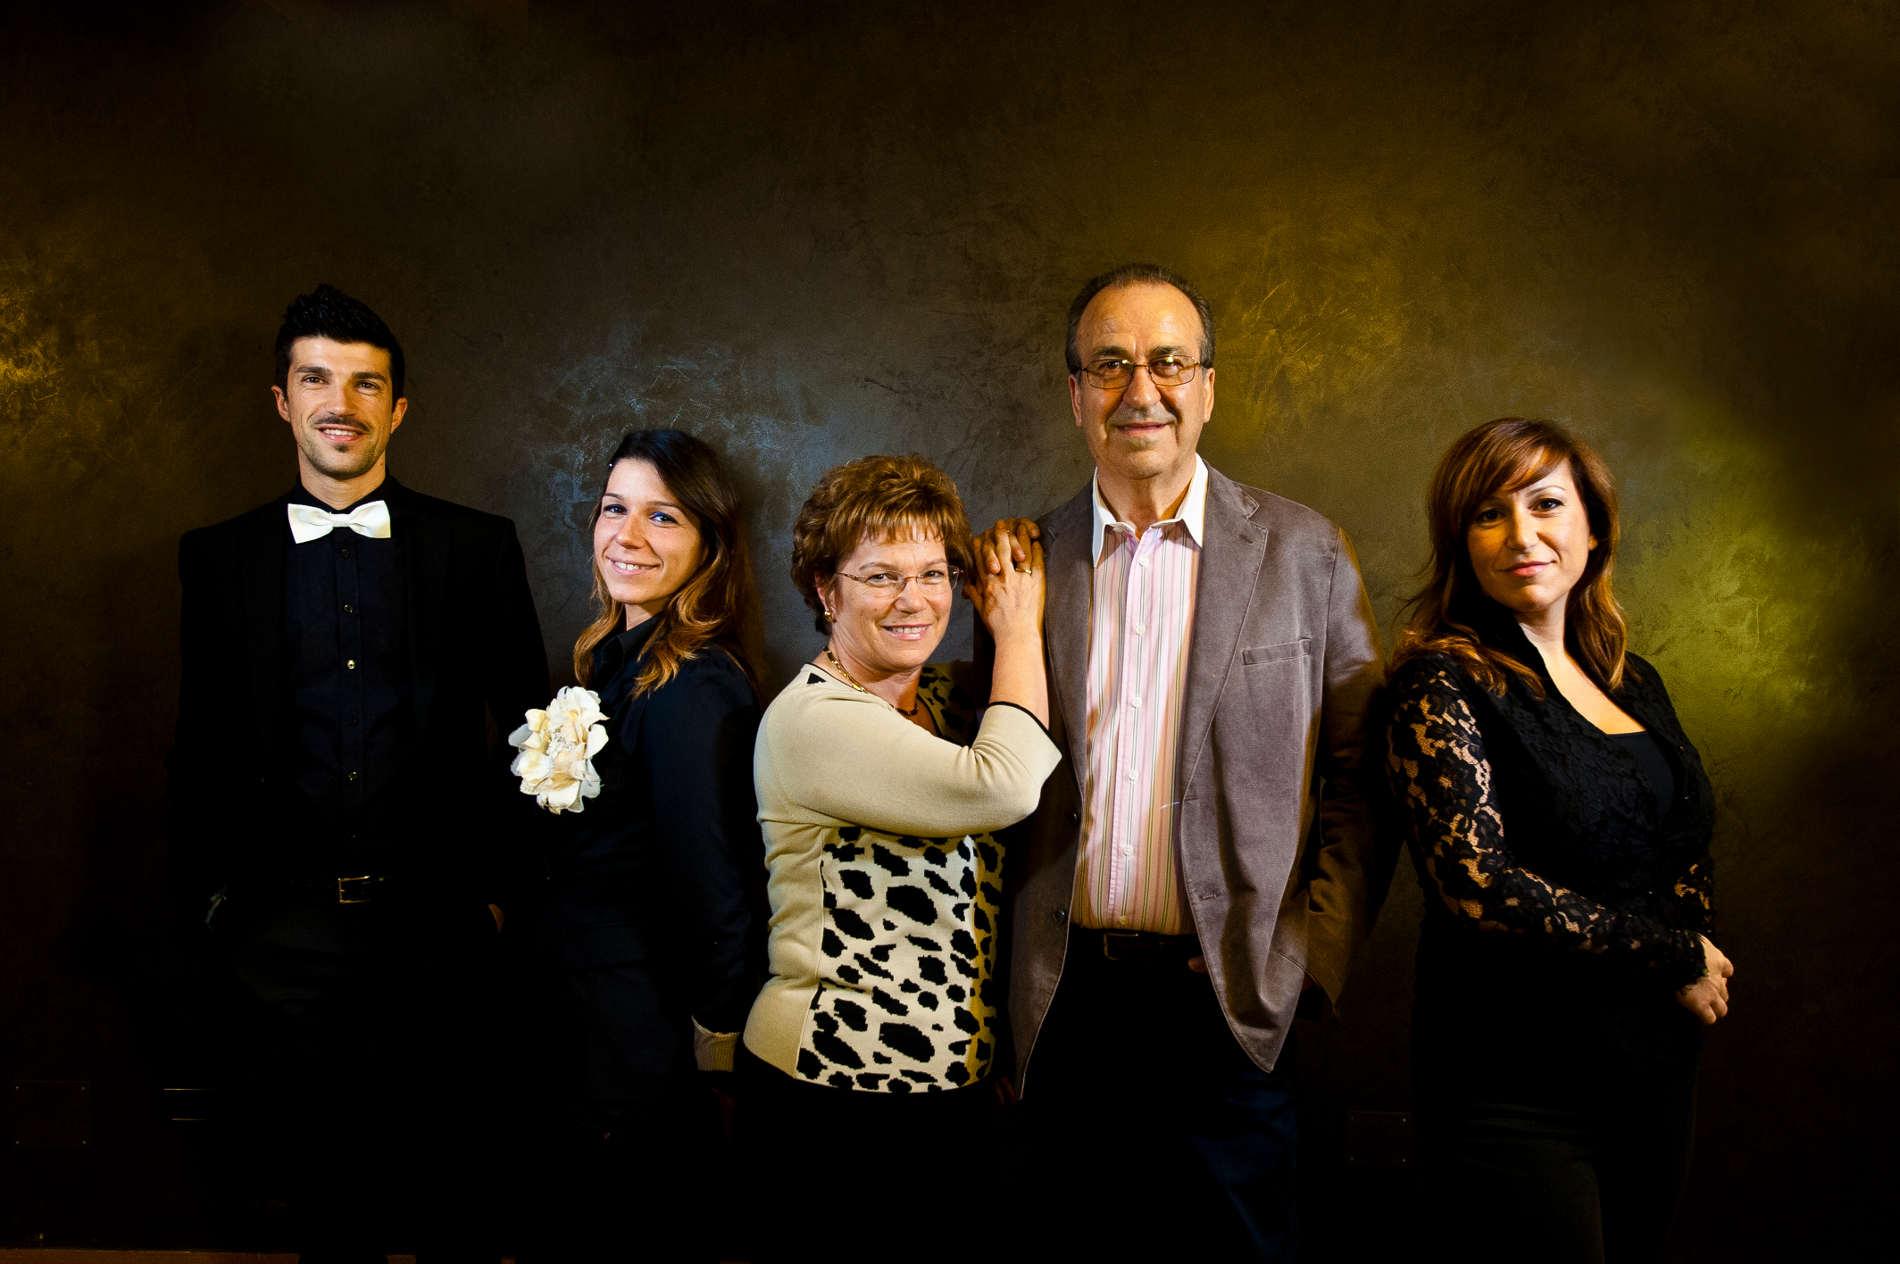 Famiglia Parolini